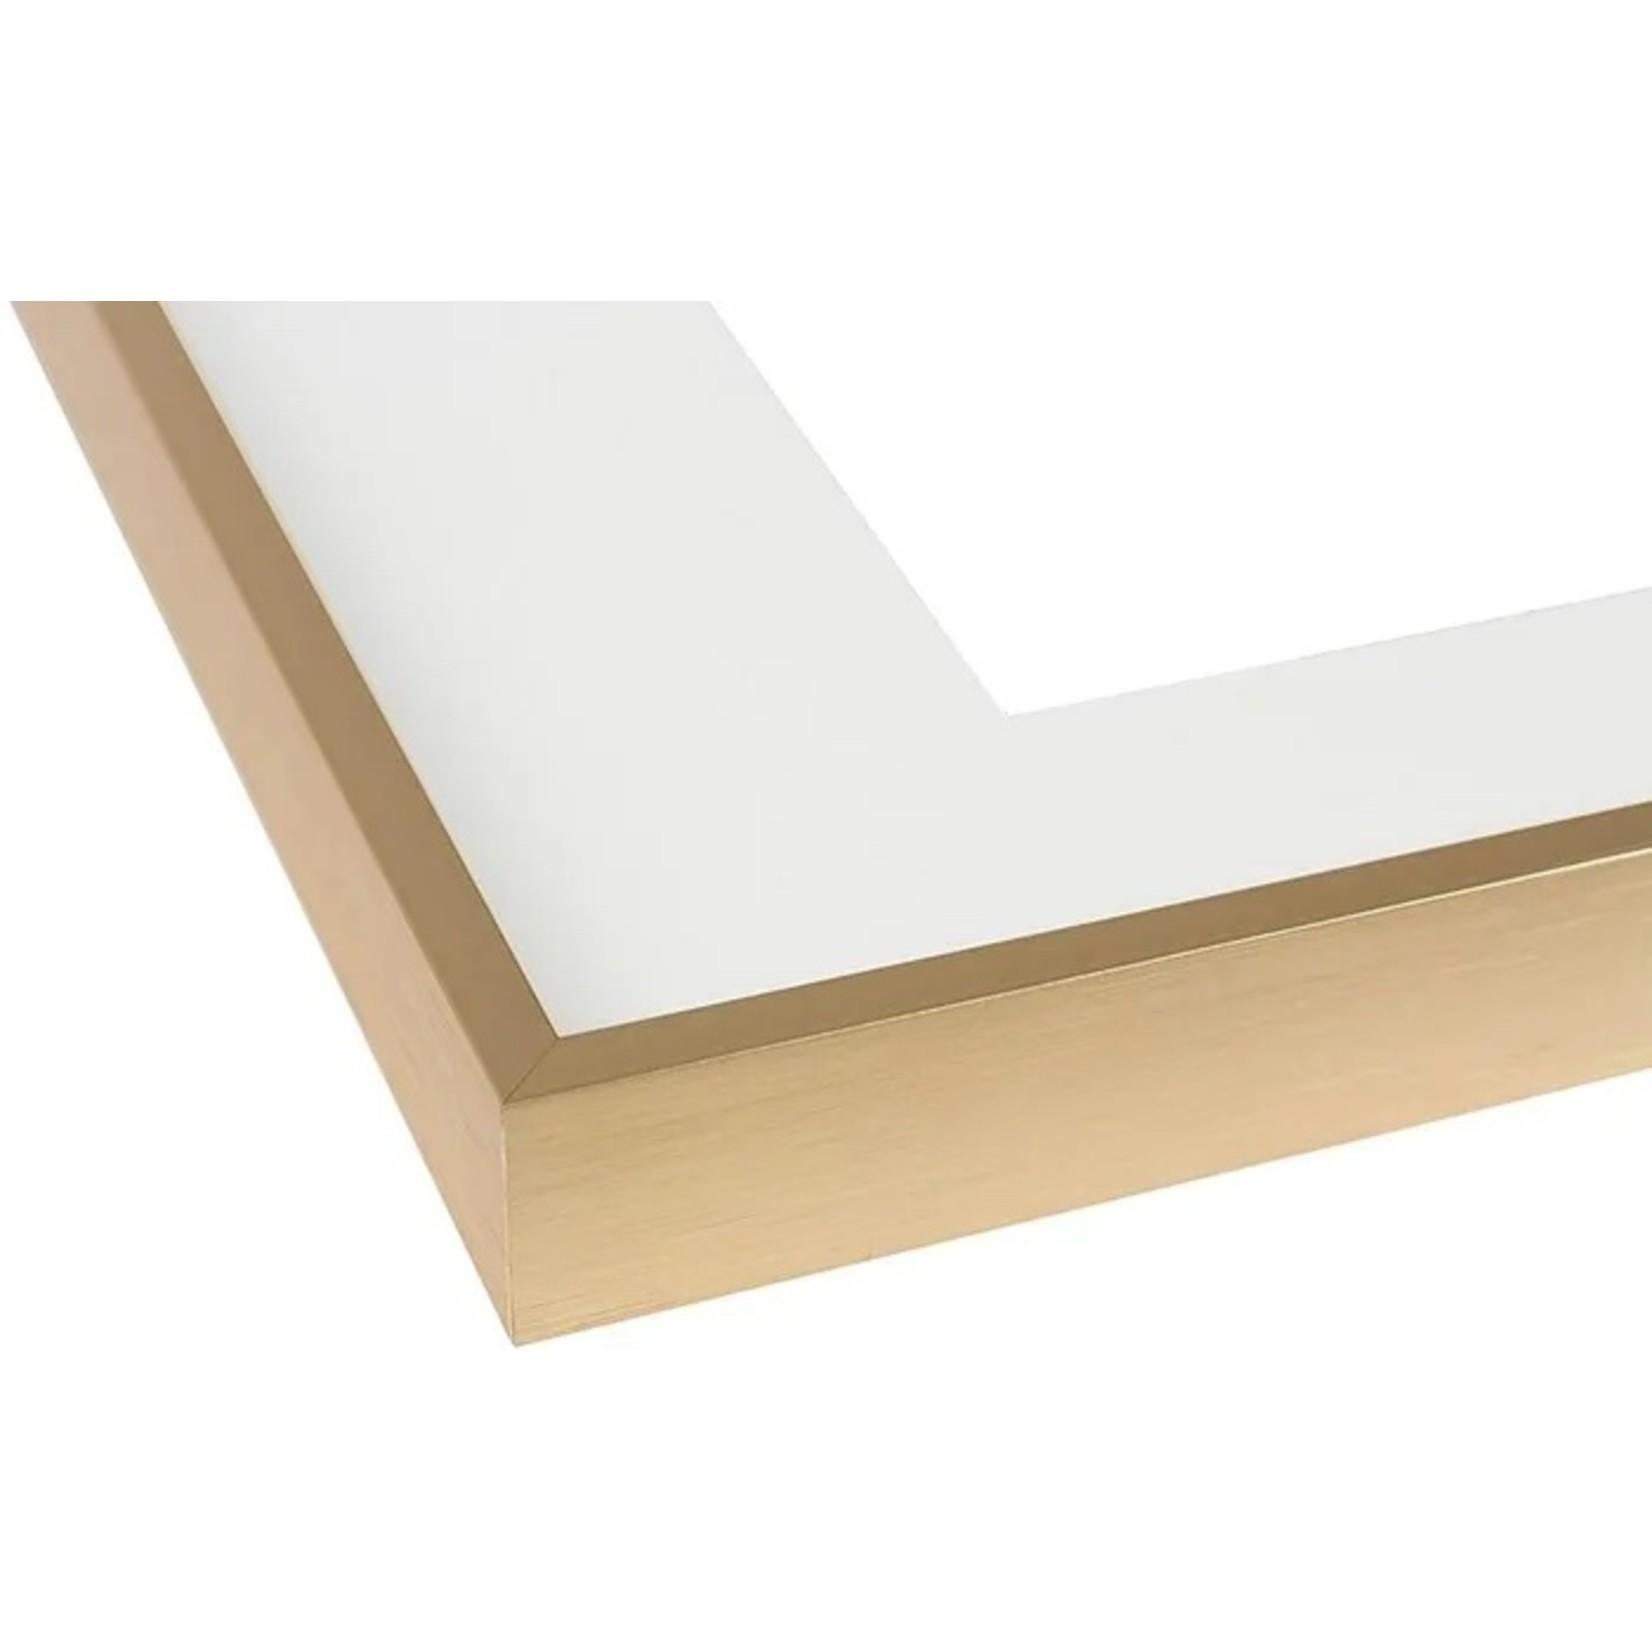 "*Aluminum Thin-Border Design Picture Frame - Gold - 16"" x 20"""